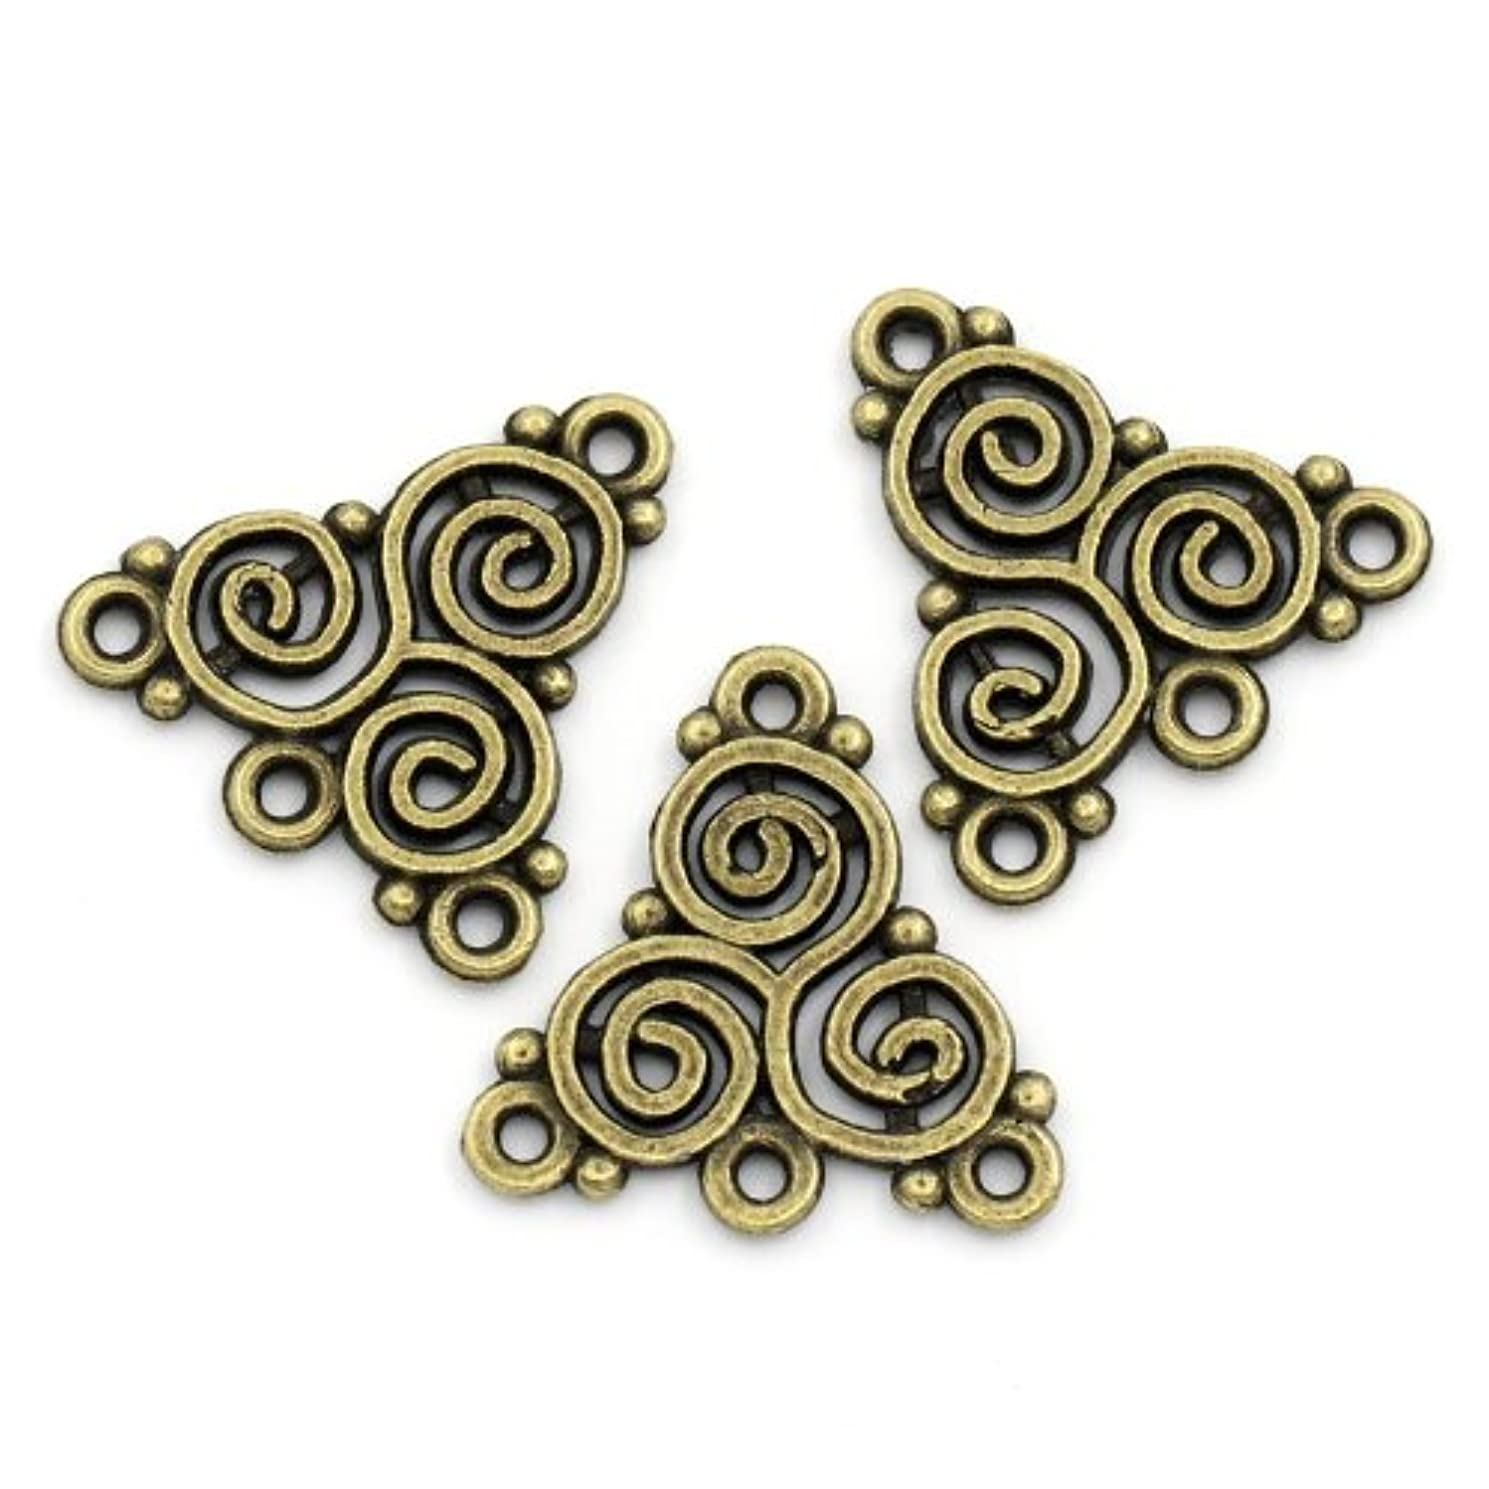 PEPPERLONELY Brand 50 PC Antique Bronze Celtic Triskelion Knot Spiral Pattern Connectors 6/8 x 6/8 Inch ( 20MM x 19.5MM )